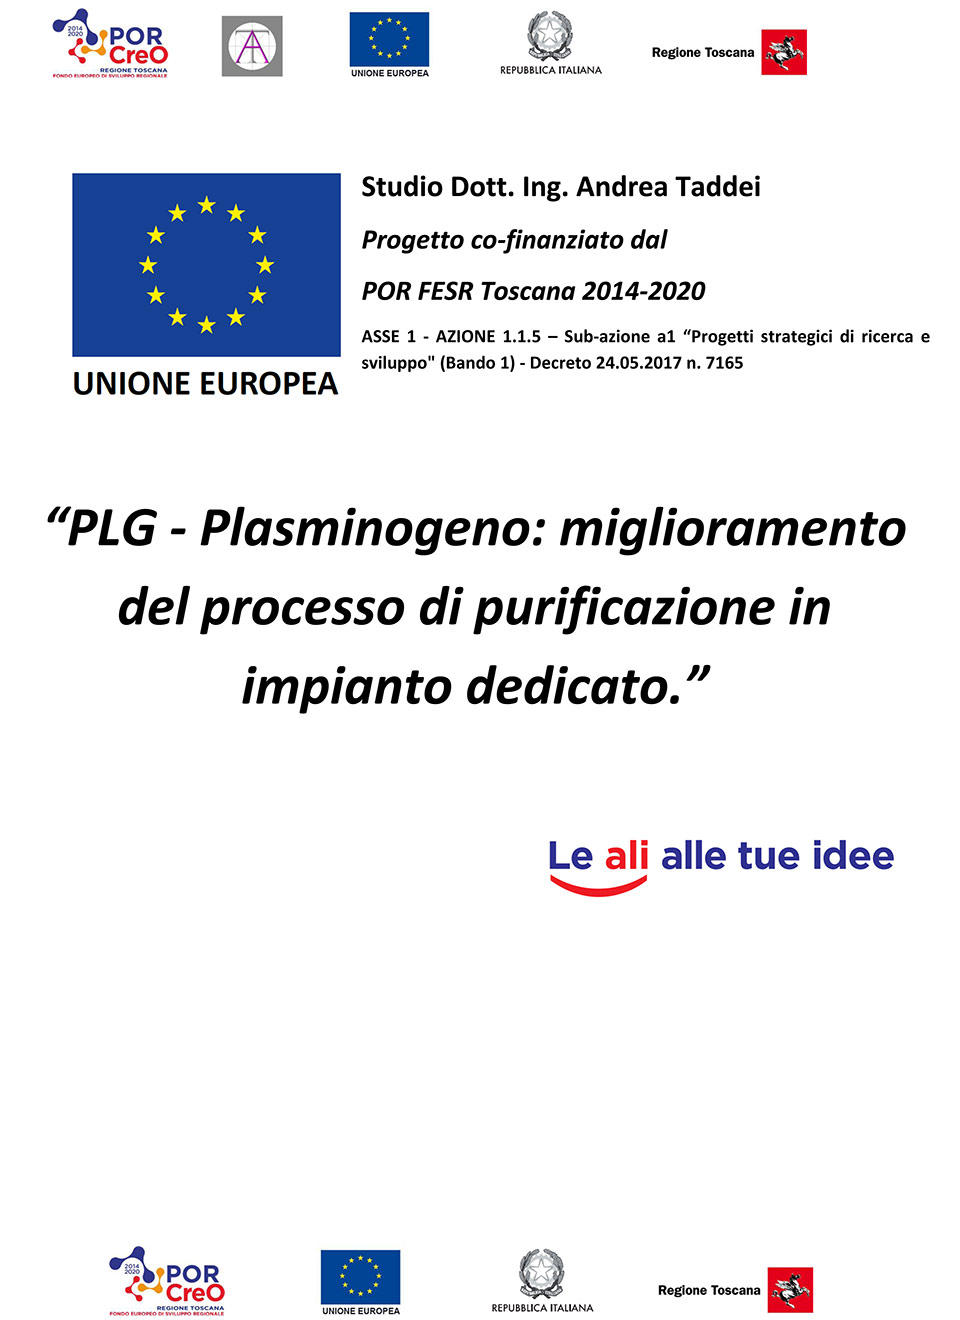 Progetto PLG